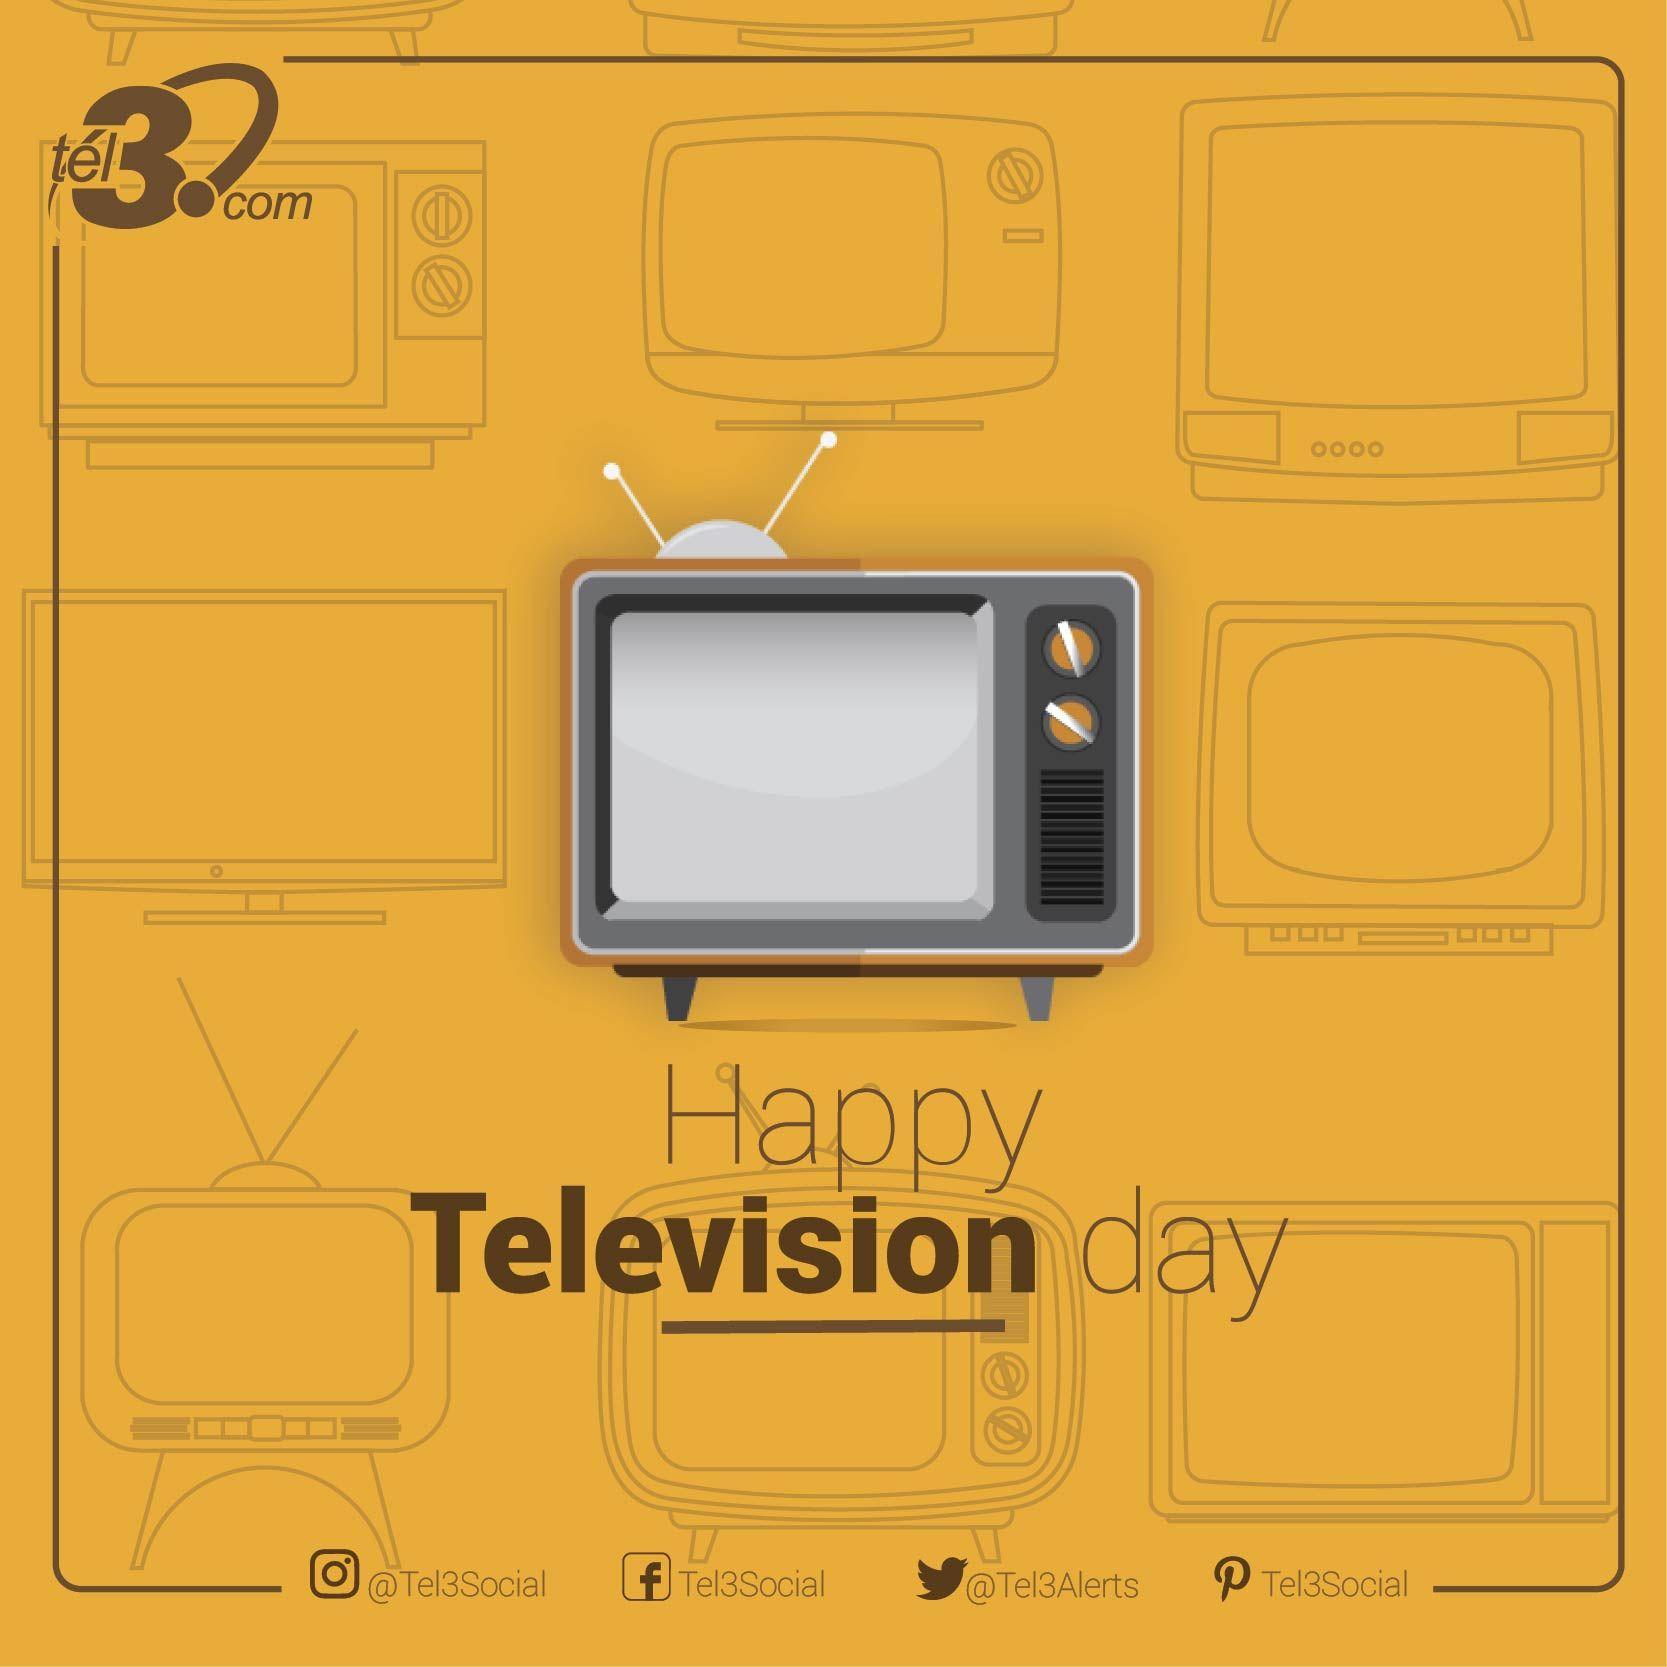 #DíaMundialDeLaTelevisión un invento que revolucionó por completo los medios de comunicación #MondayMotivation